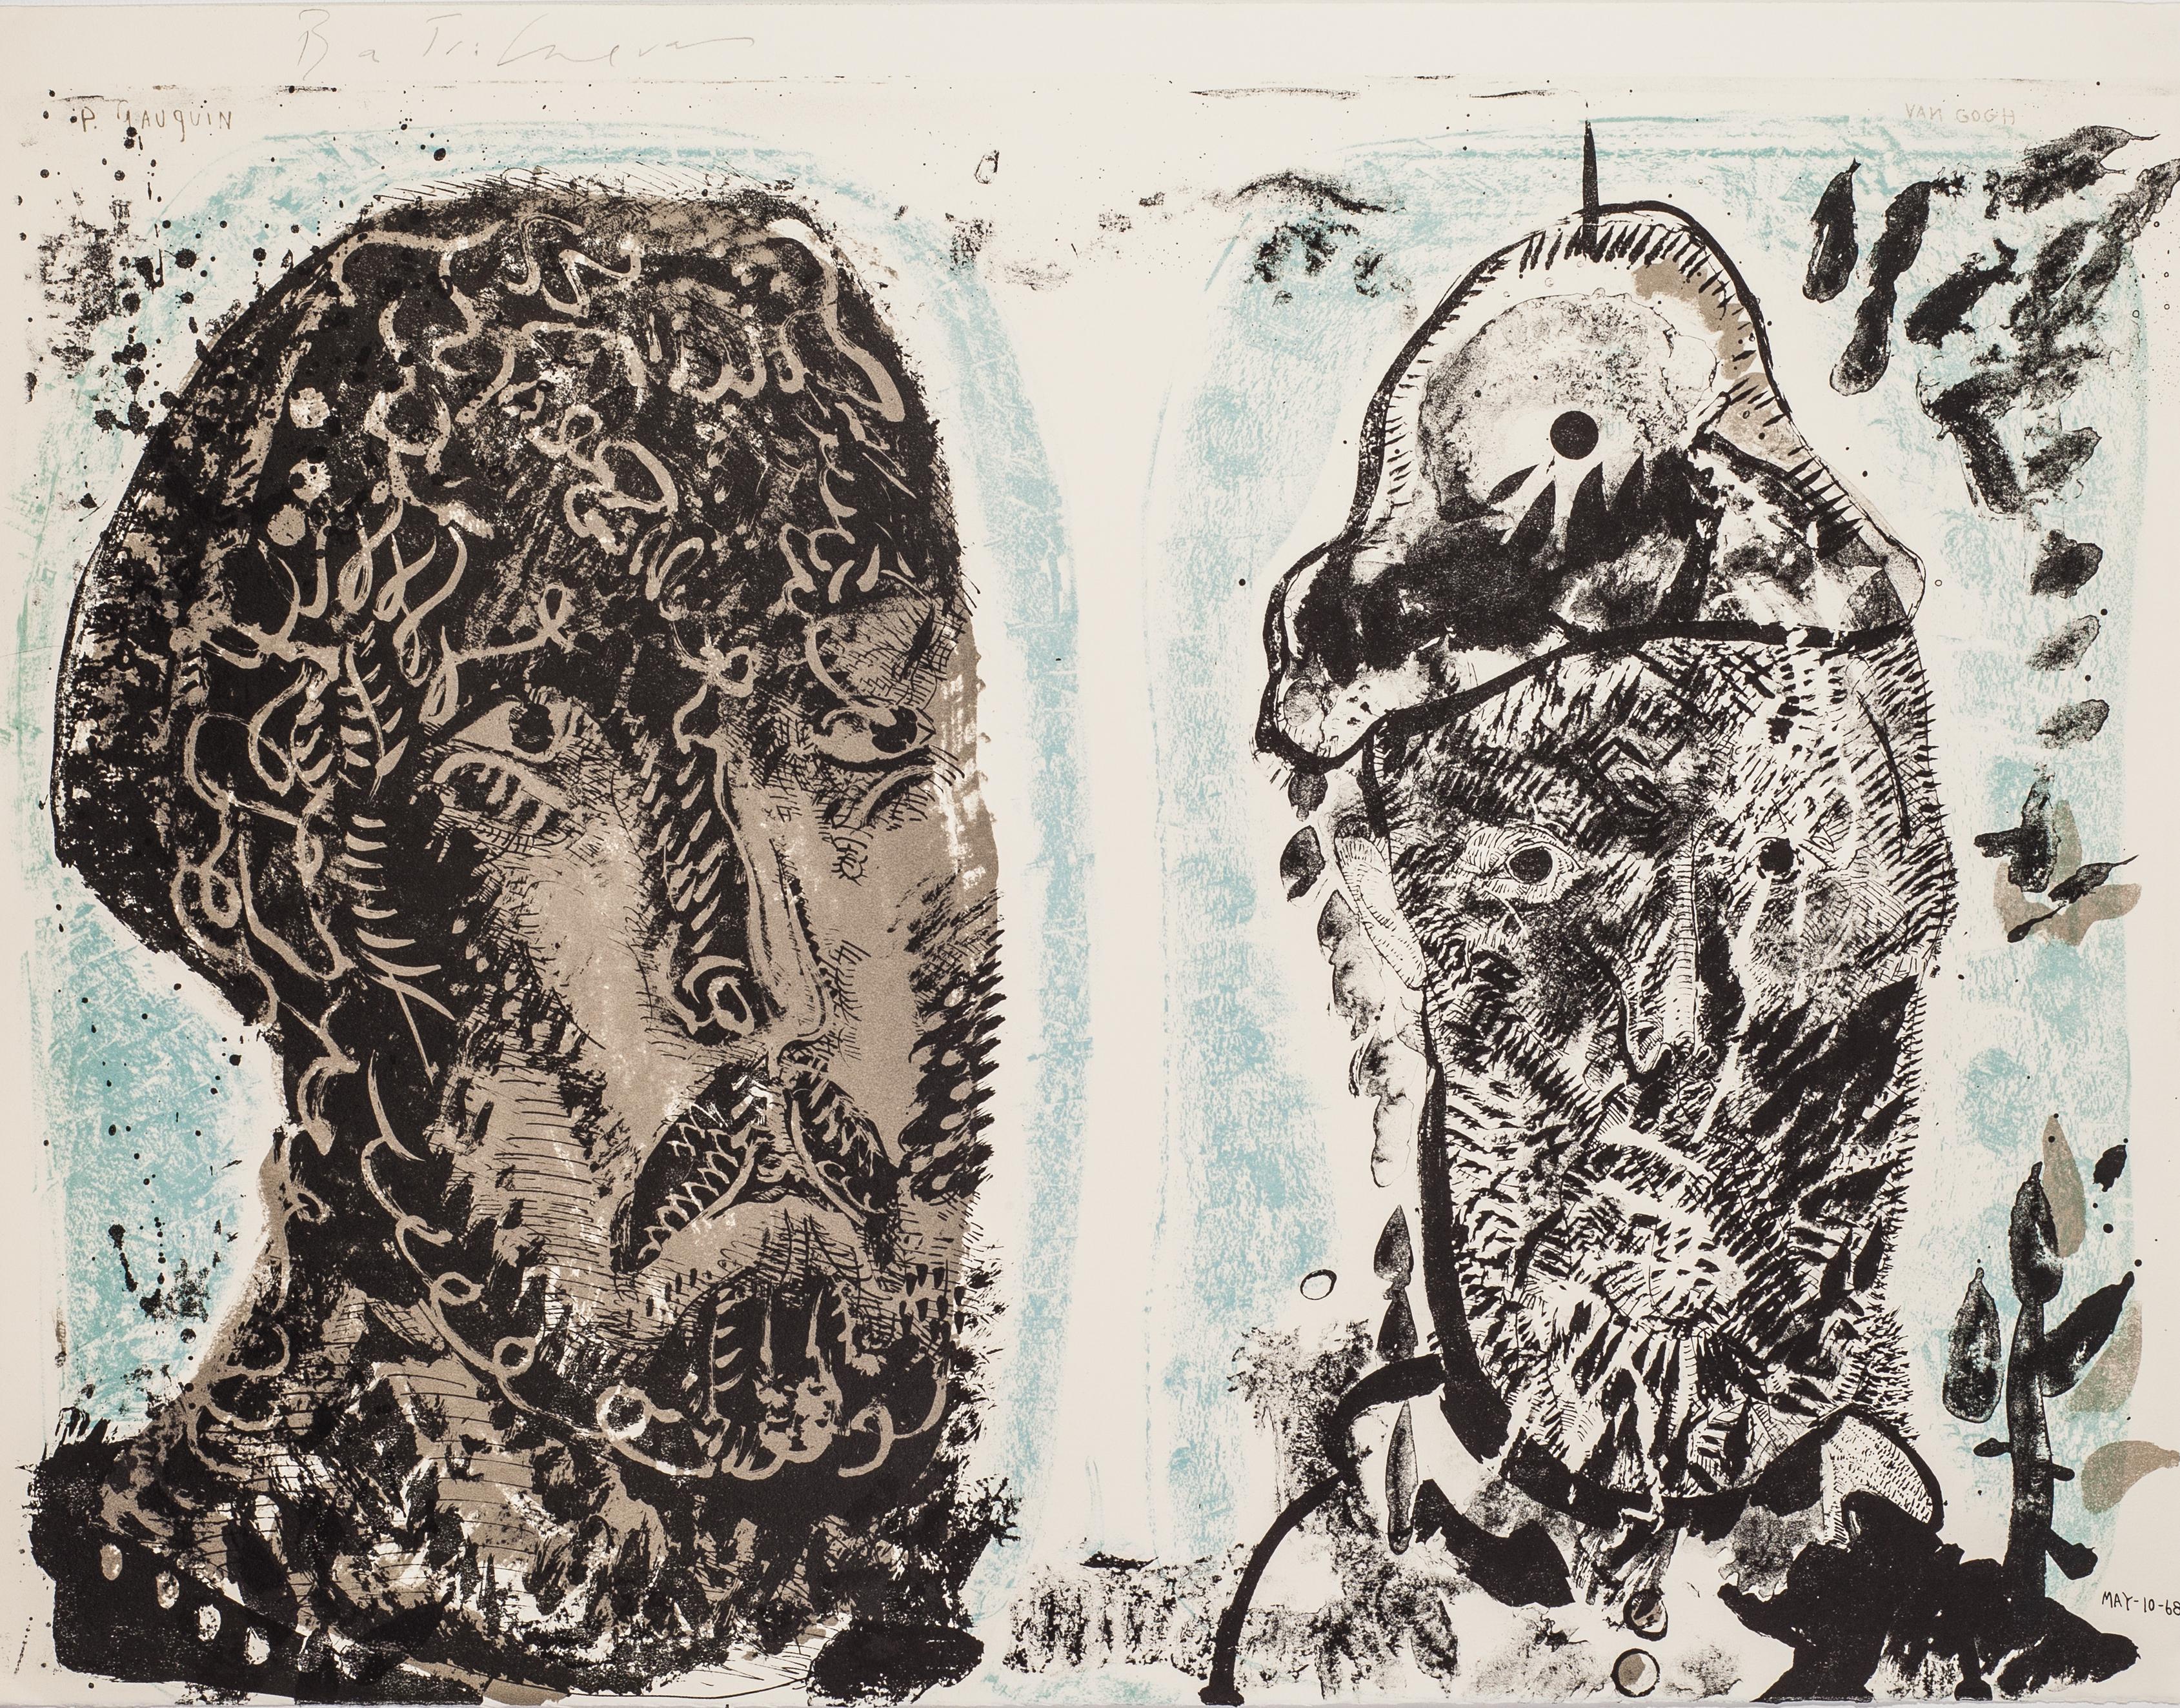 Van Gogh's Criminal Obsessions by Jose Luis Cuevas - original lithograph